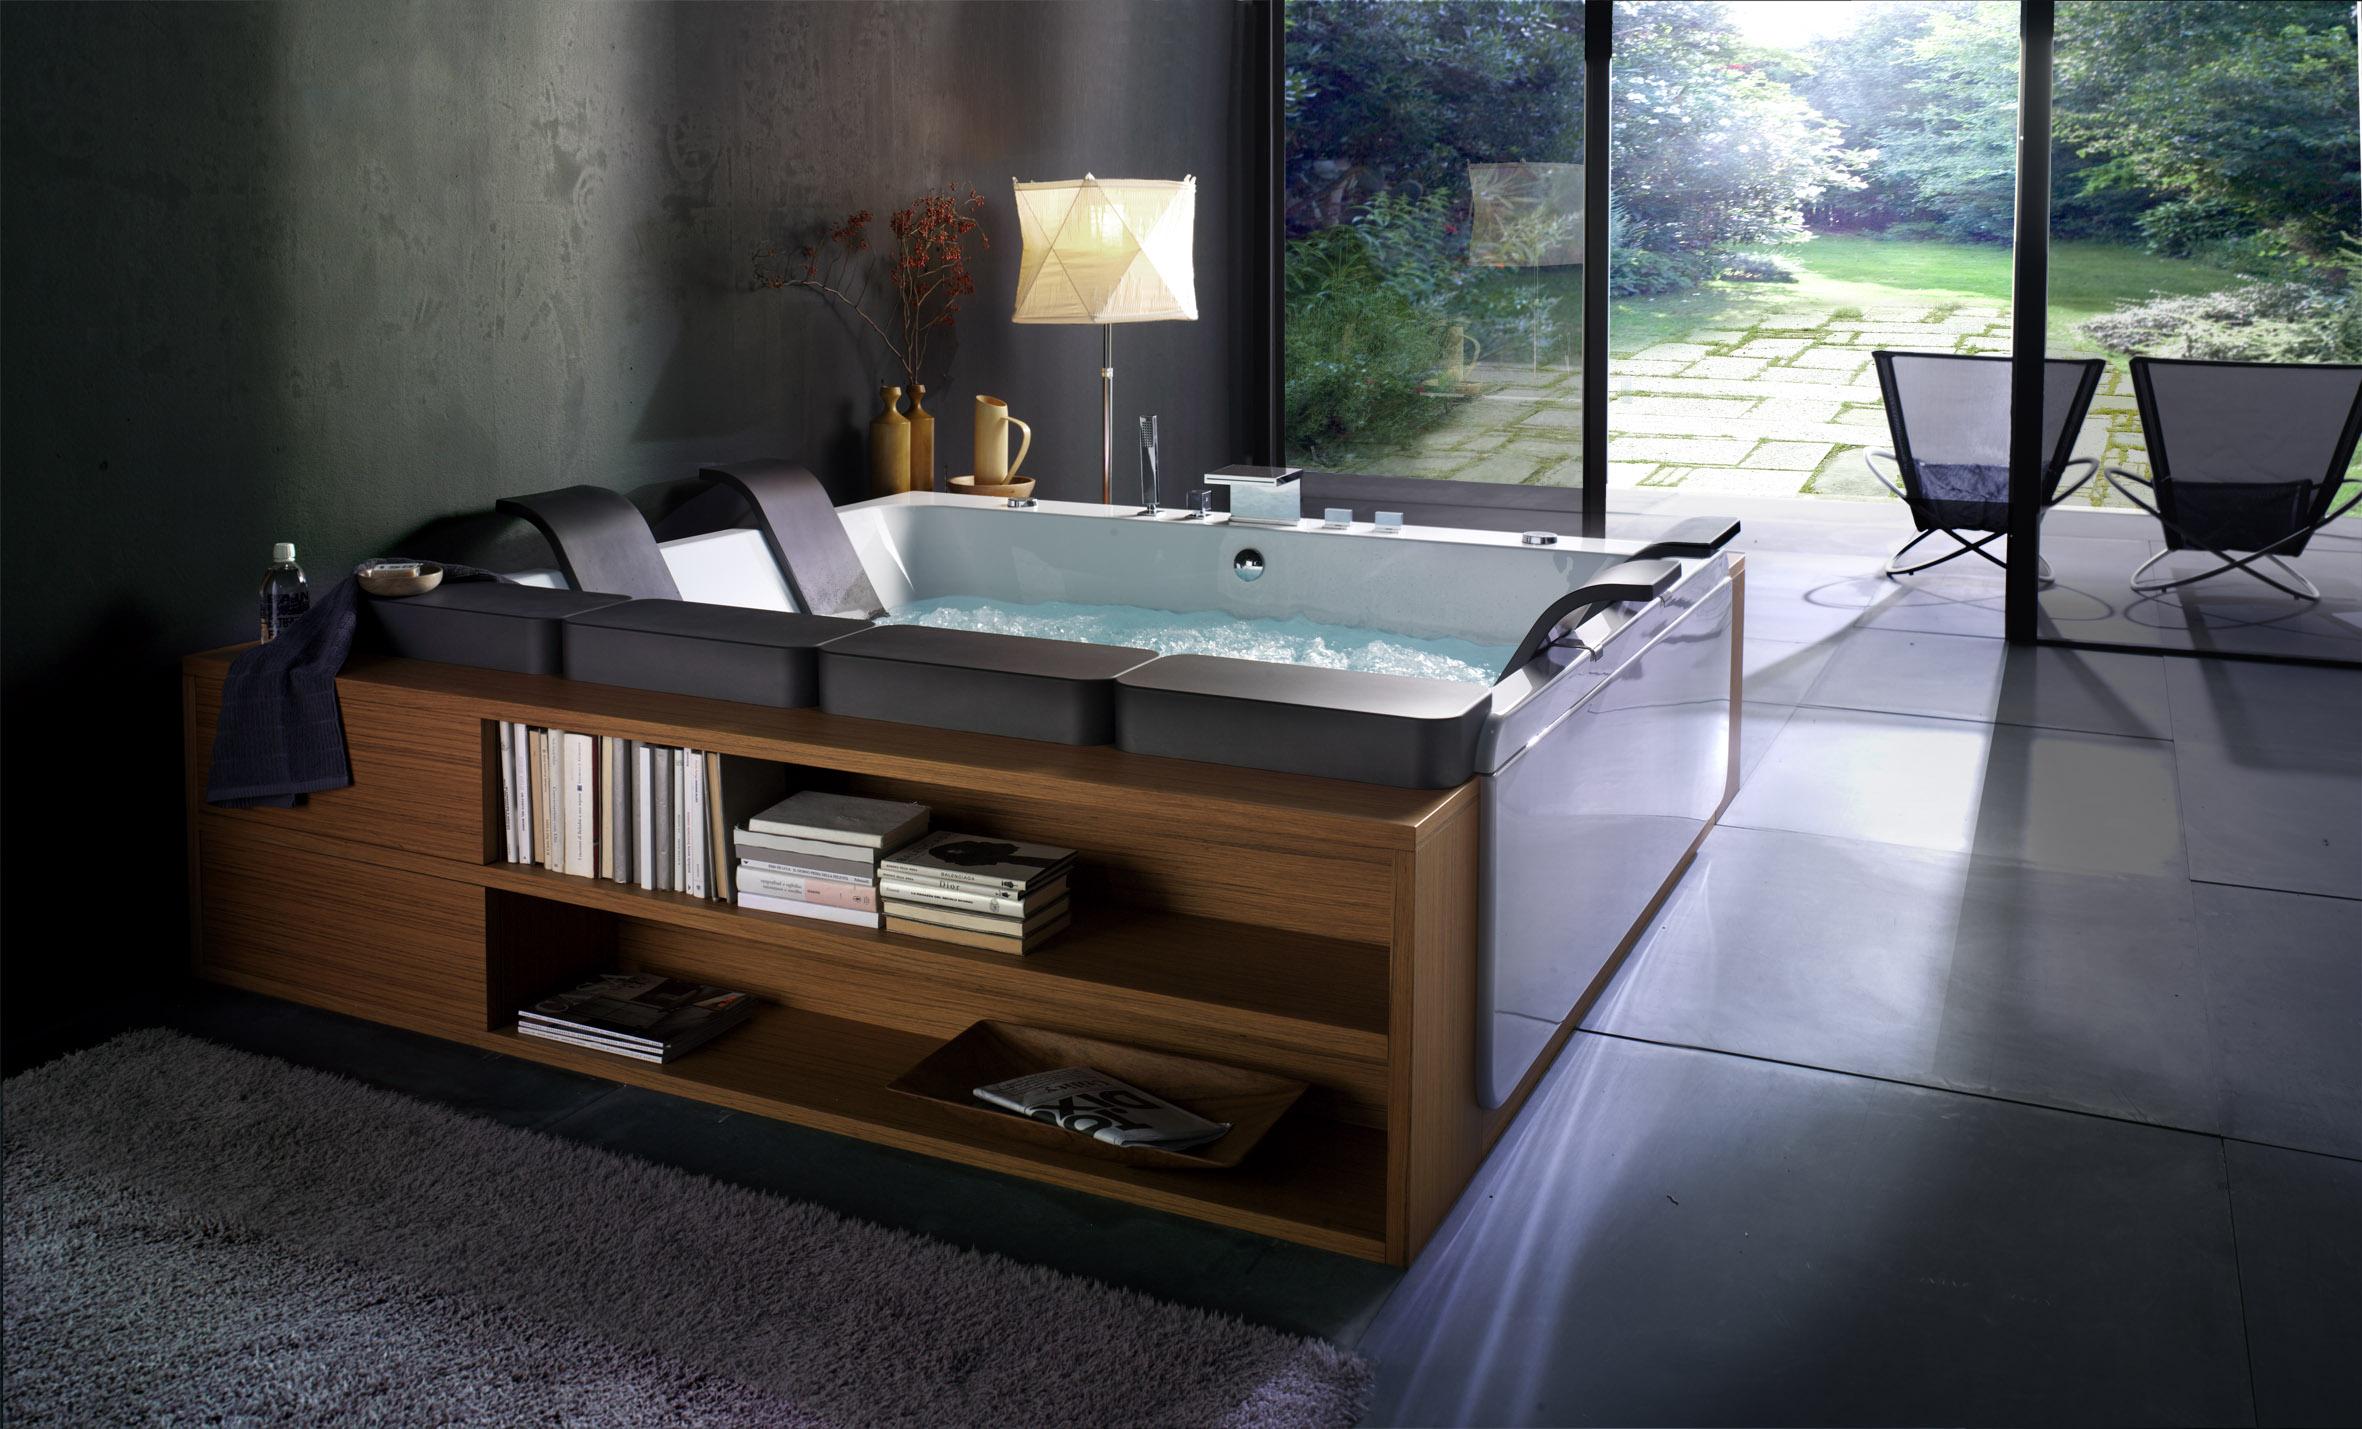 Vasca Da Bagno Extra Large : Vasche da bagno extralarge bagno